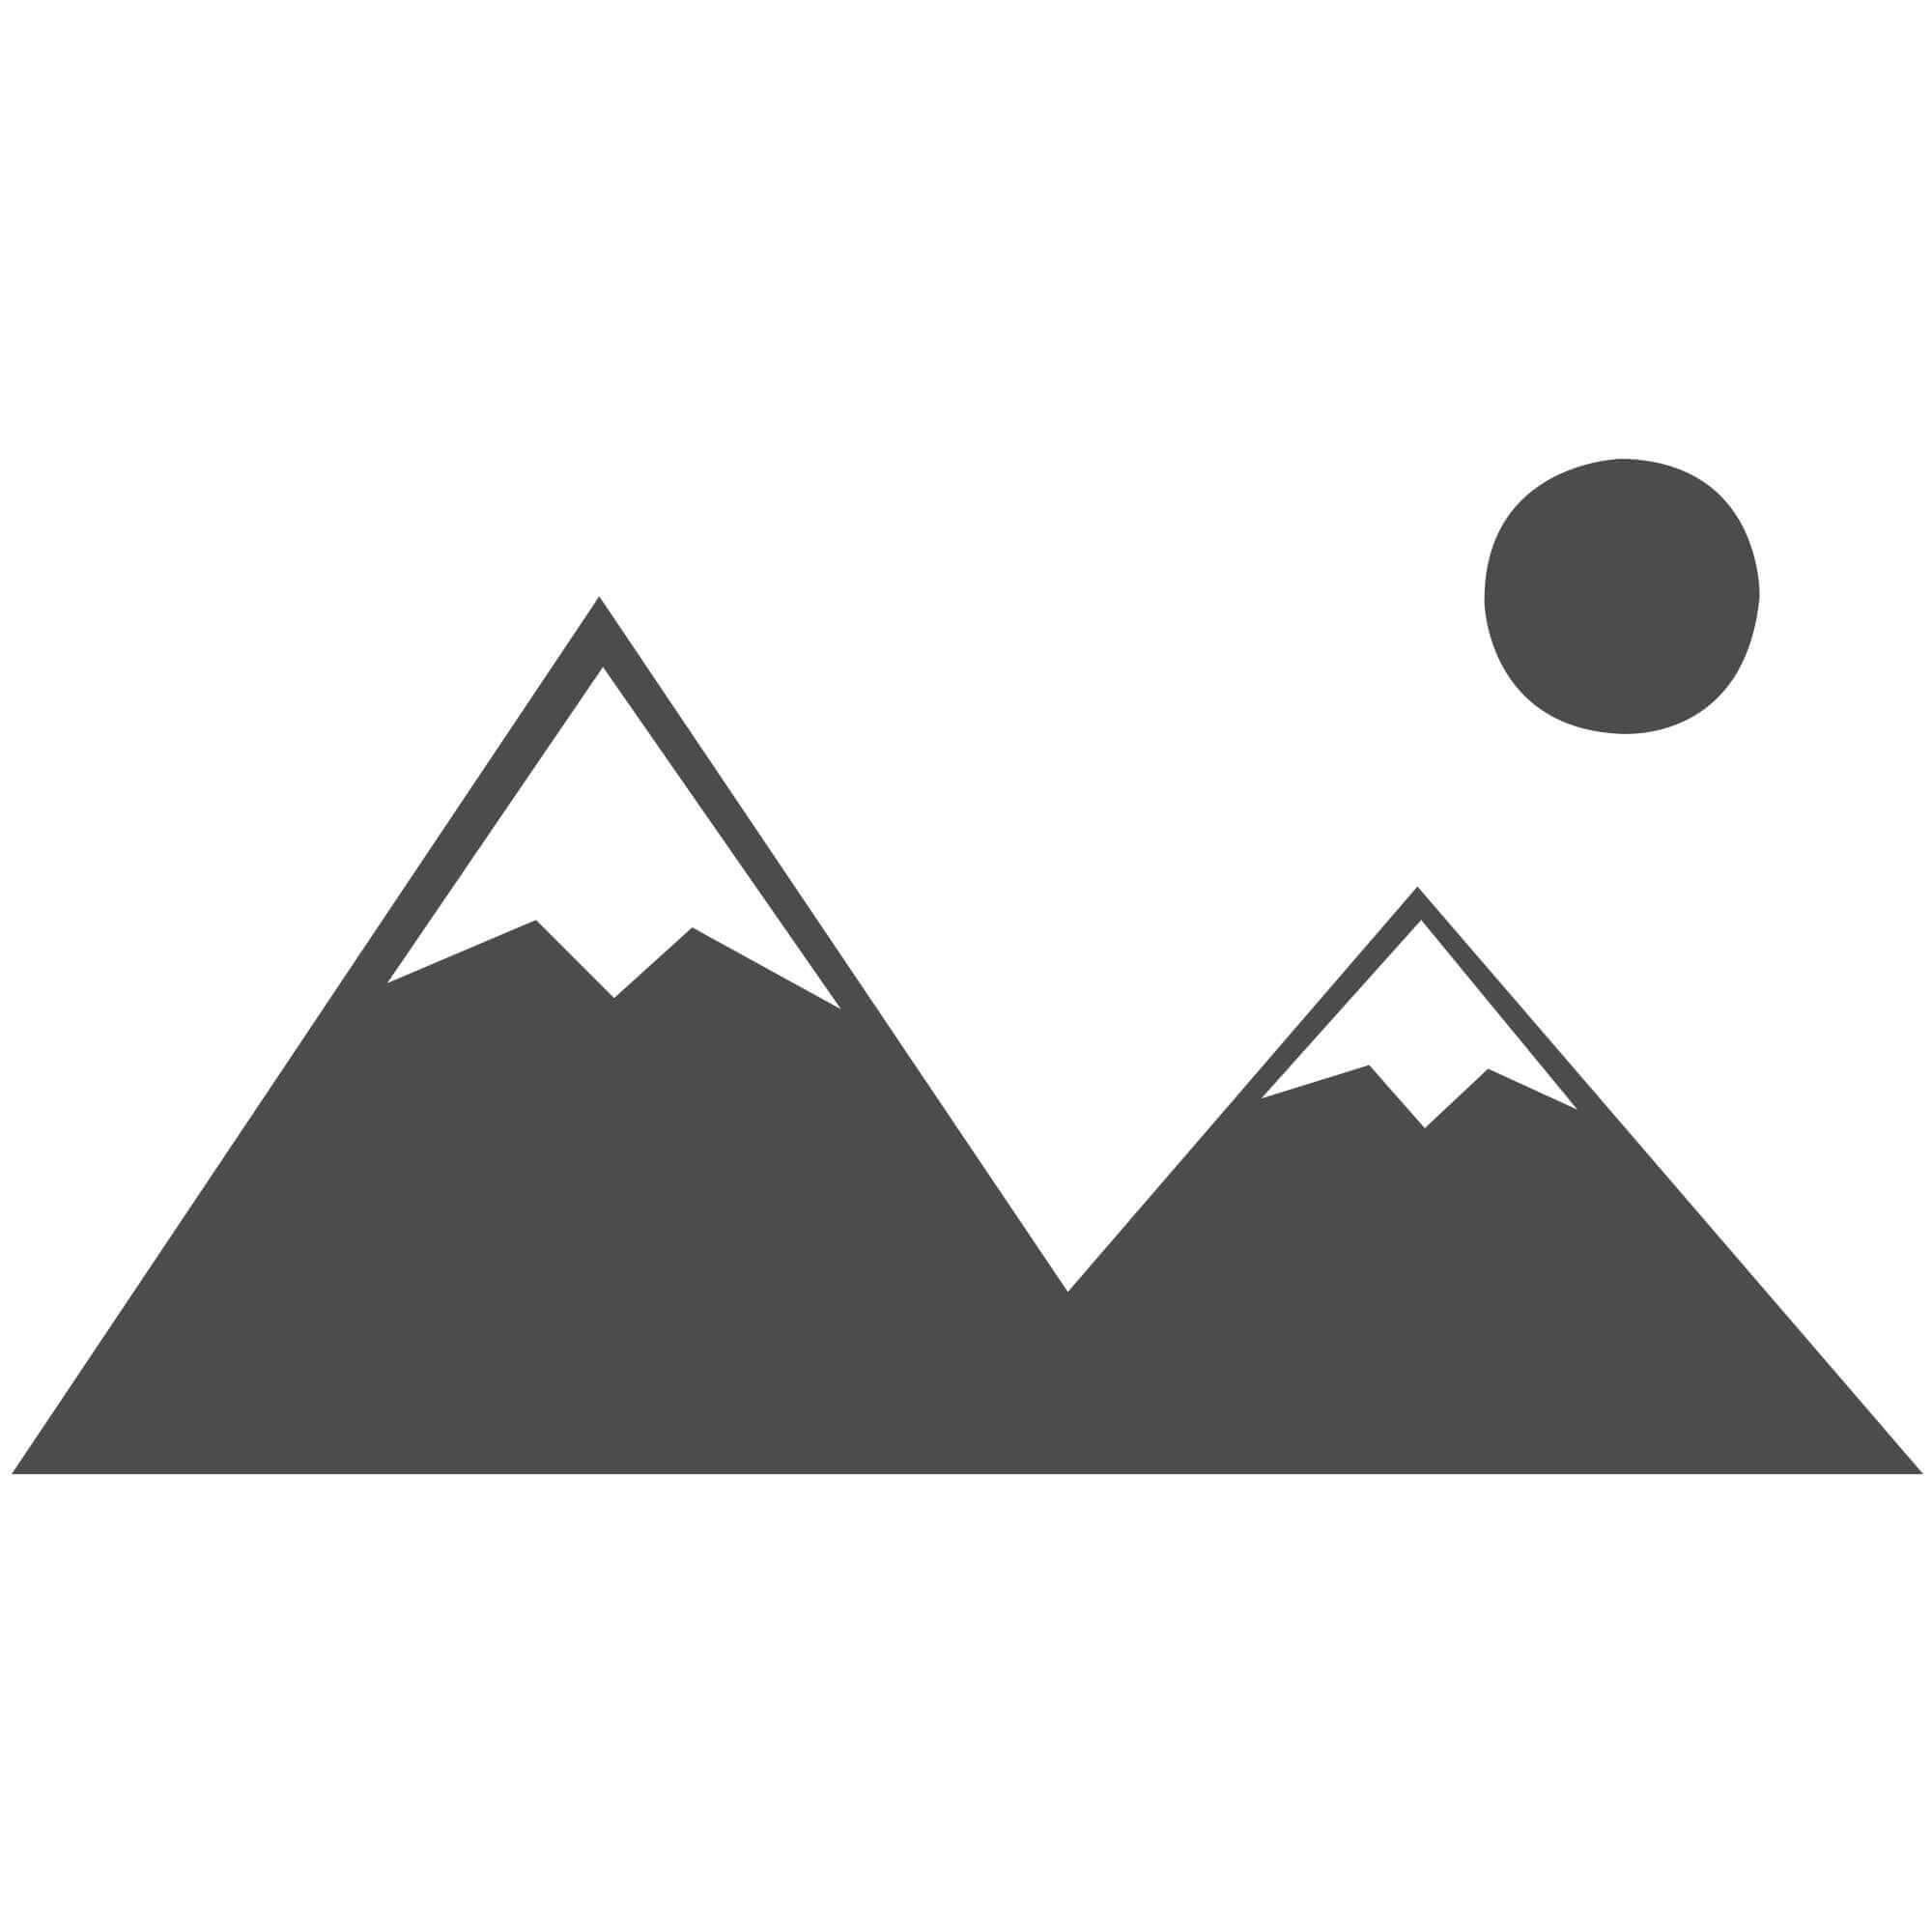 "Griot Stripe Rug - Kalimba - KI804 Clove-244 x 320 cm (8' x 10'6"")"